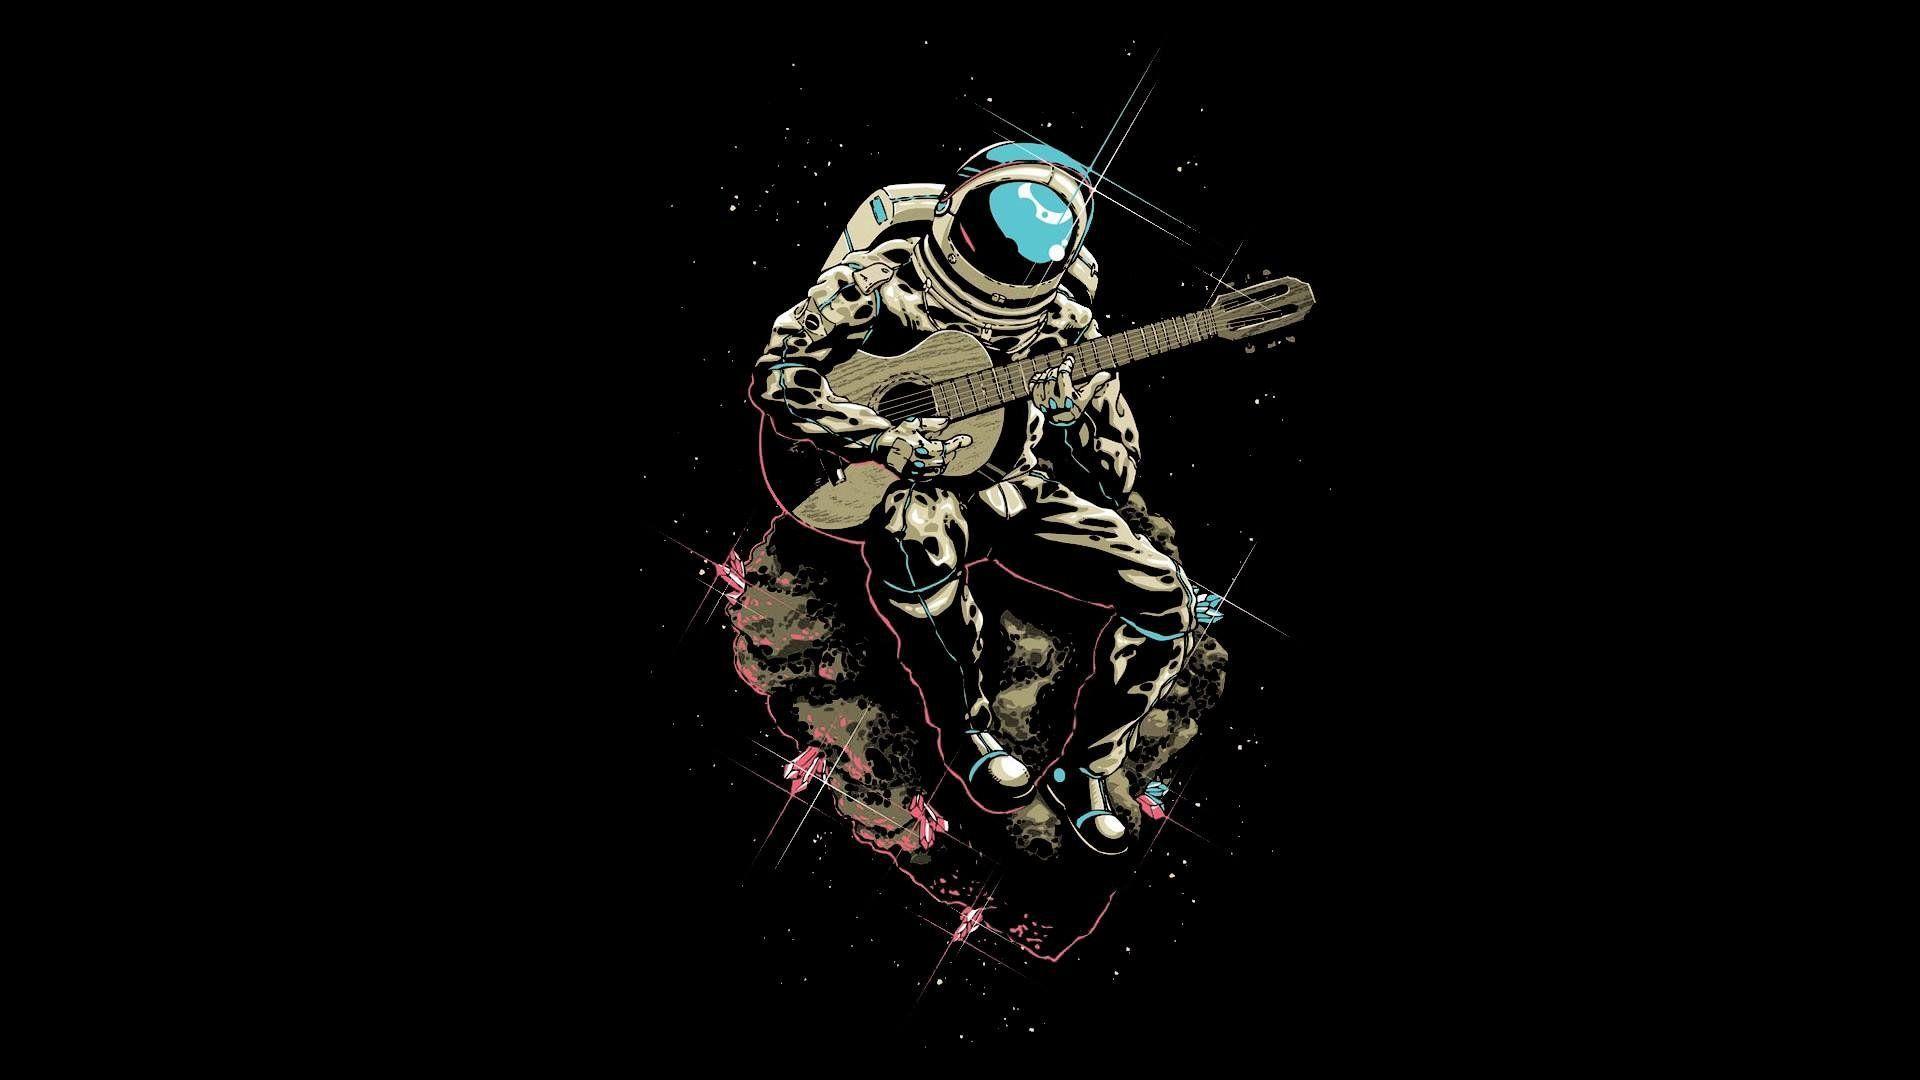 Astronaut Plays Guitar High Definition Wallpaper Astronaut Tattoo Astronaut Wallpaper Astronaut